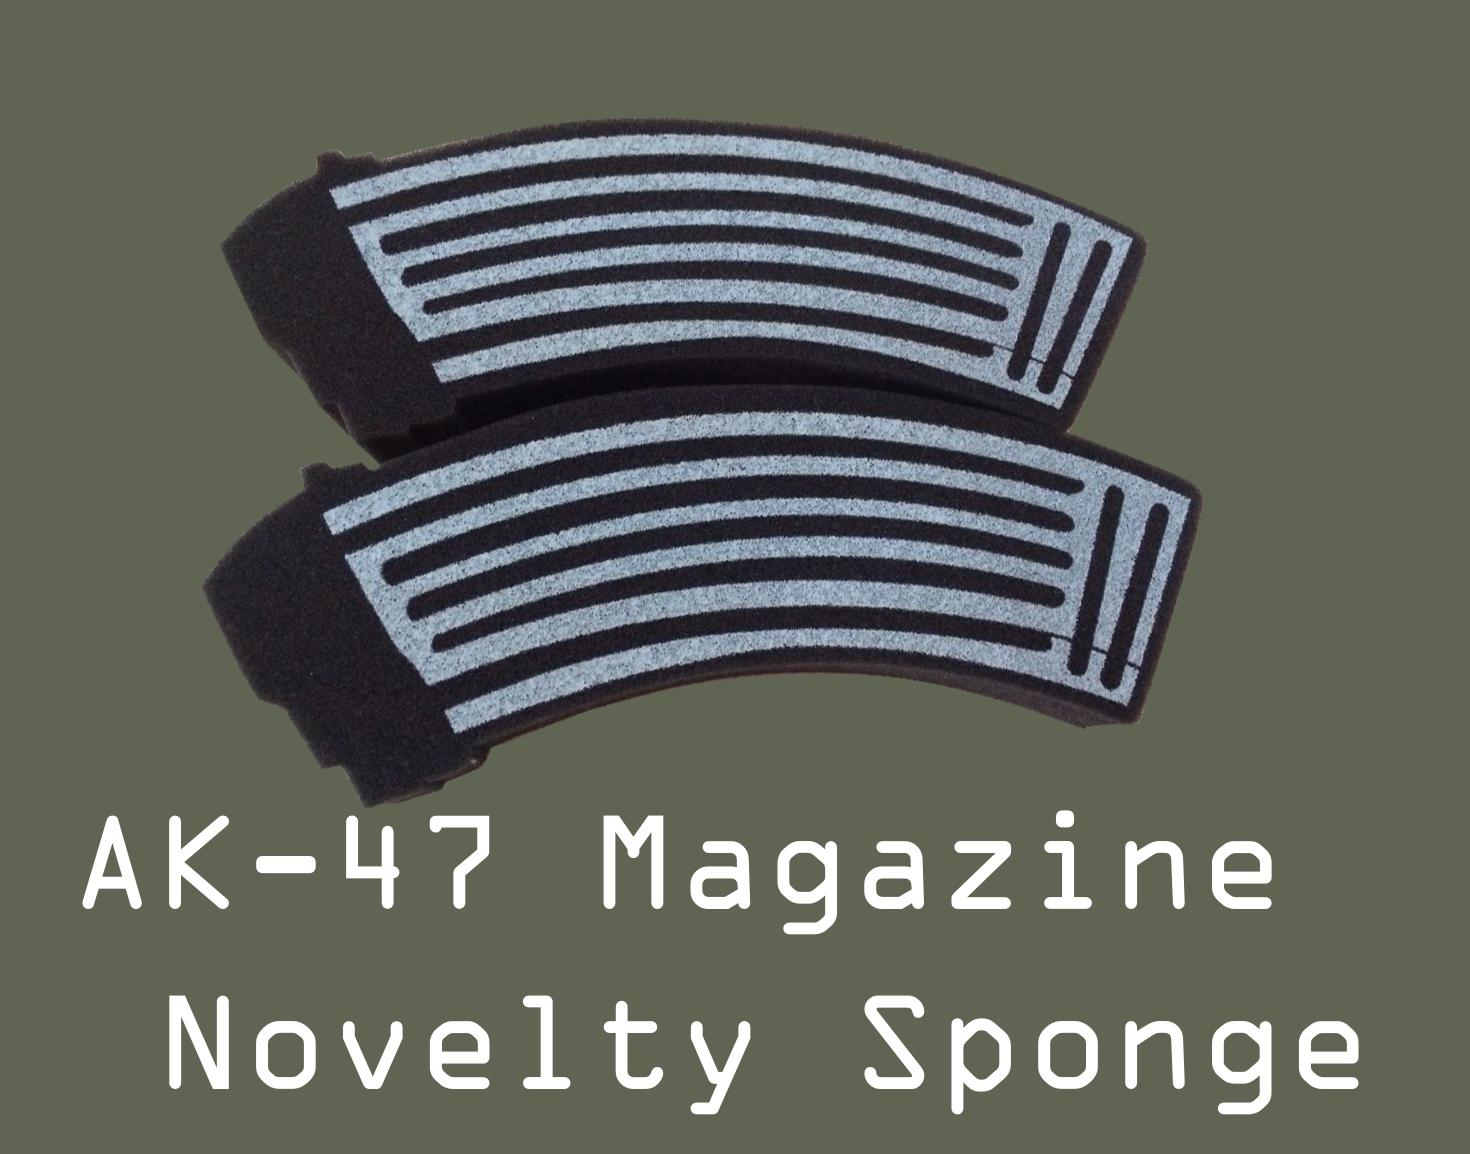 AK Novelty Sponge